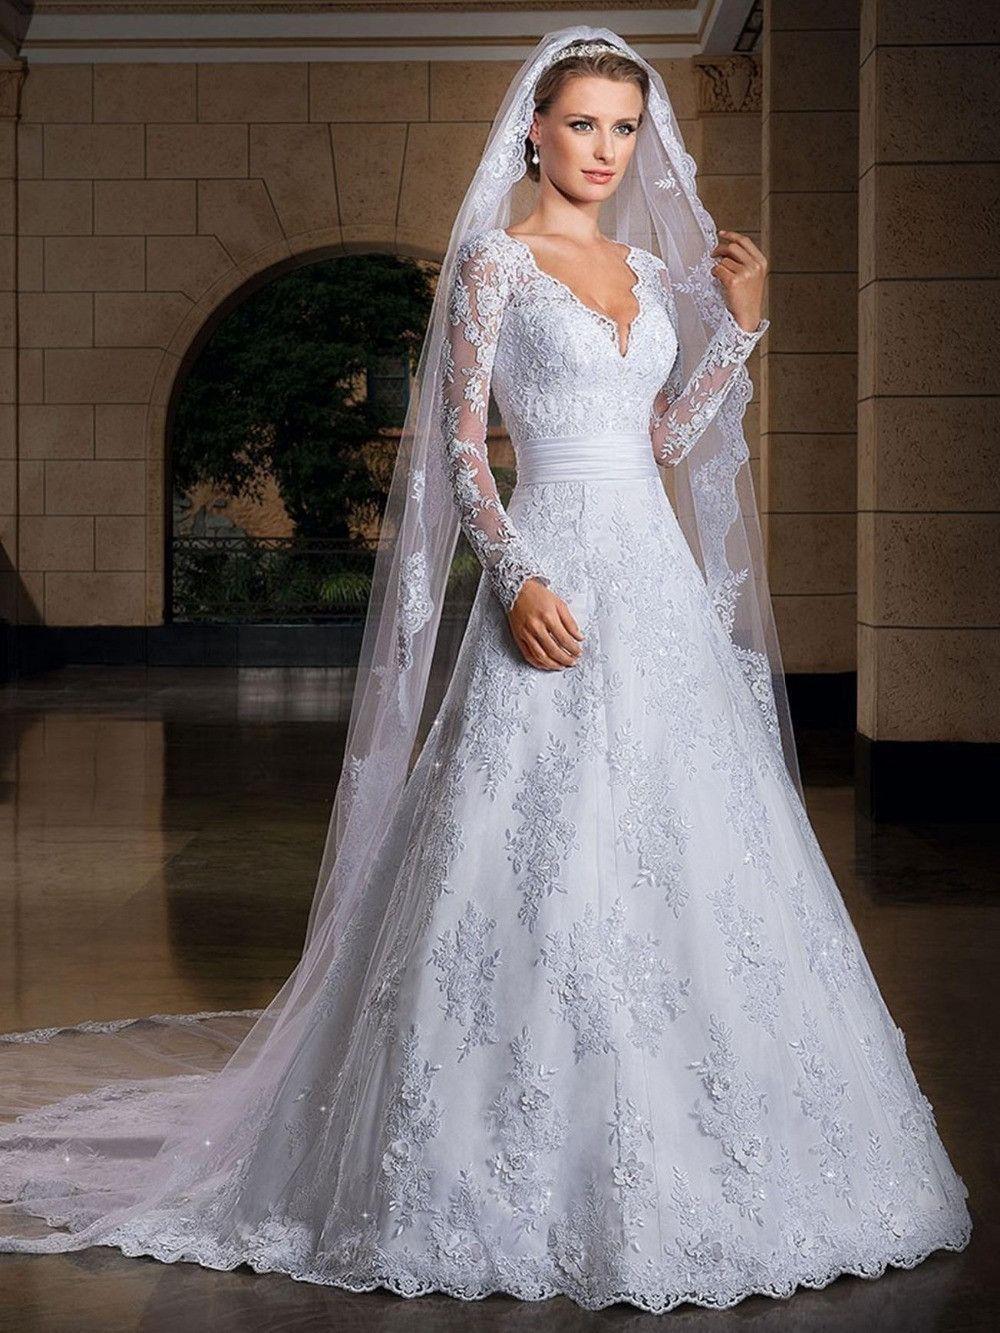 Long Sleeve Lace Wedding Dress with veil wedding ideas Pinterest